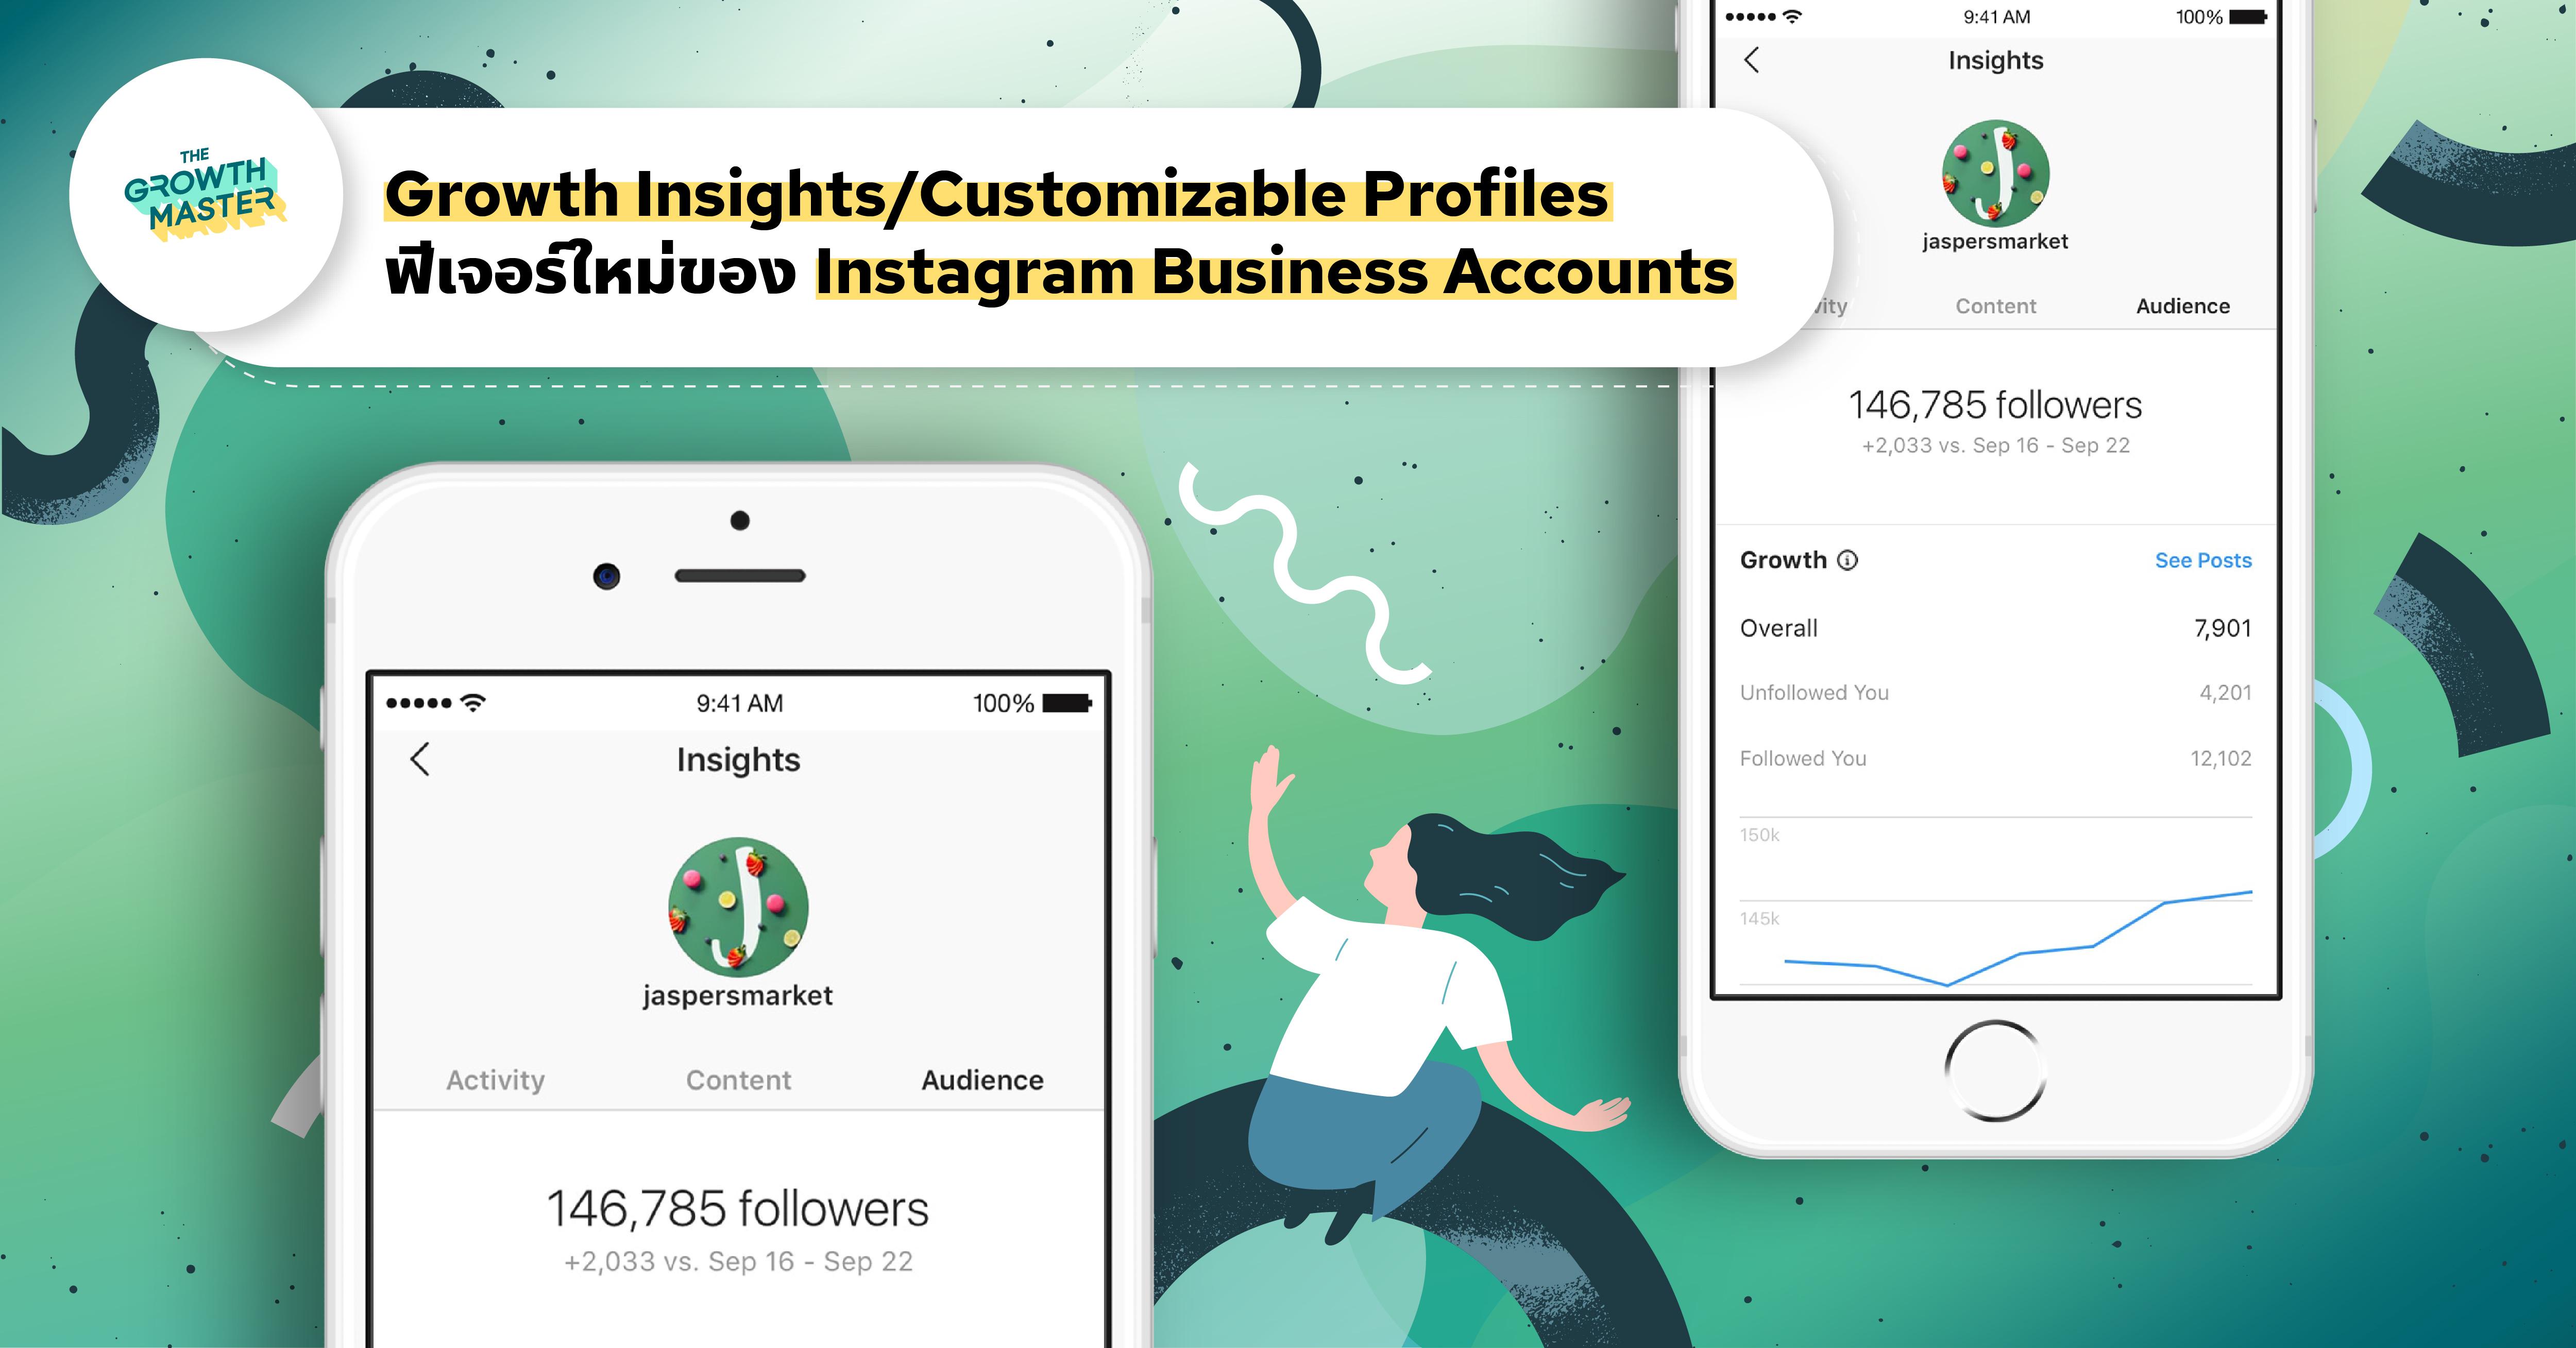 Instagram เพิ่ม 5 ฟีเจอร์ใหม่สำหรับ Business Account ช่วยให้ธุรกิจเติบโตบนแพลตฟอร์มมากขึ้น